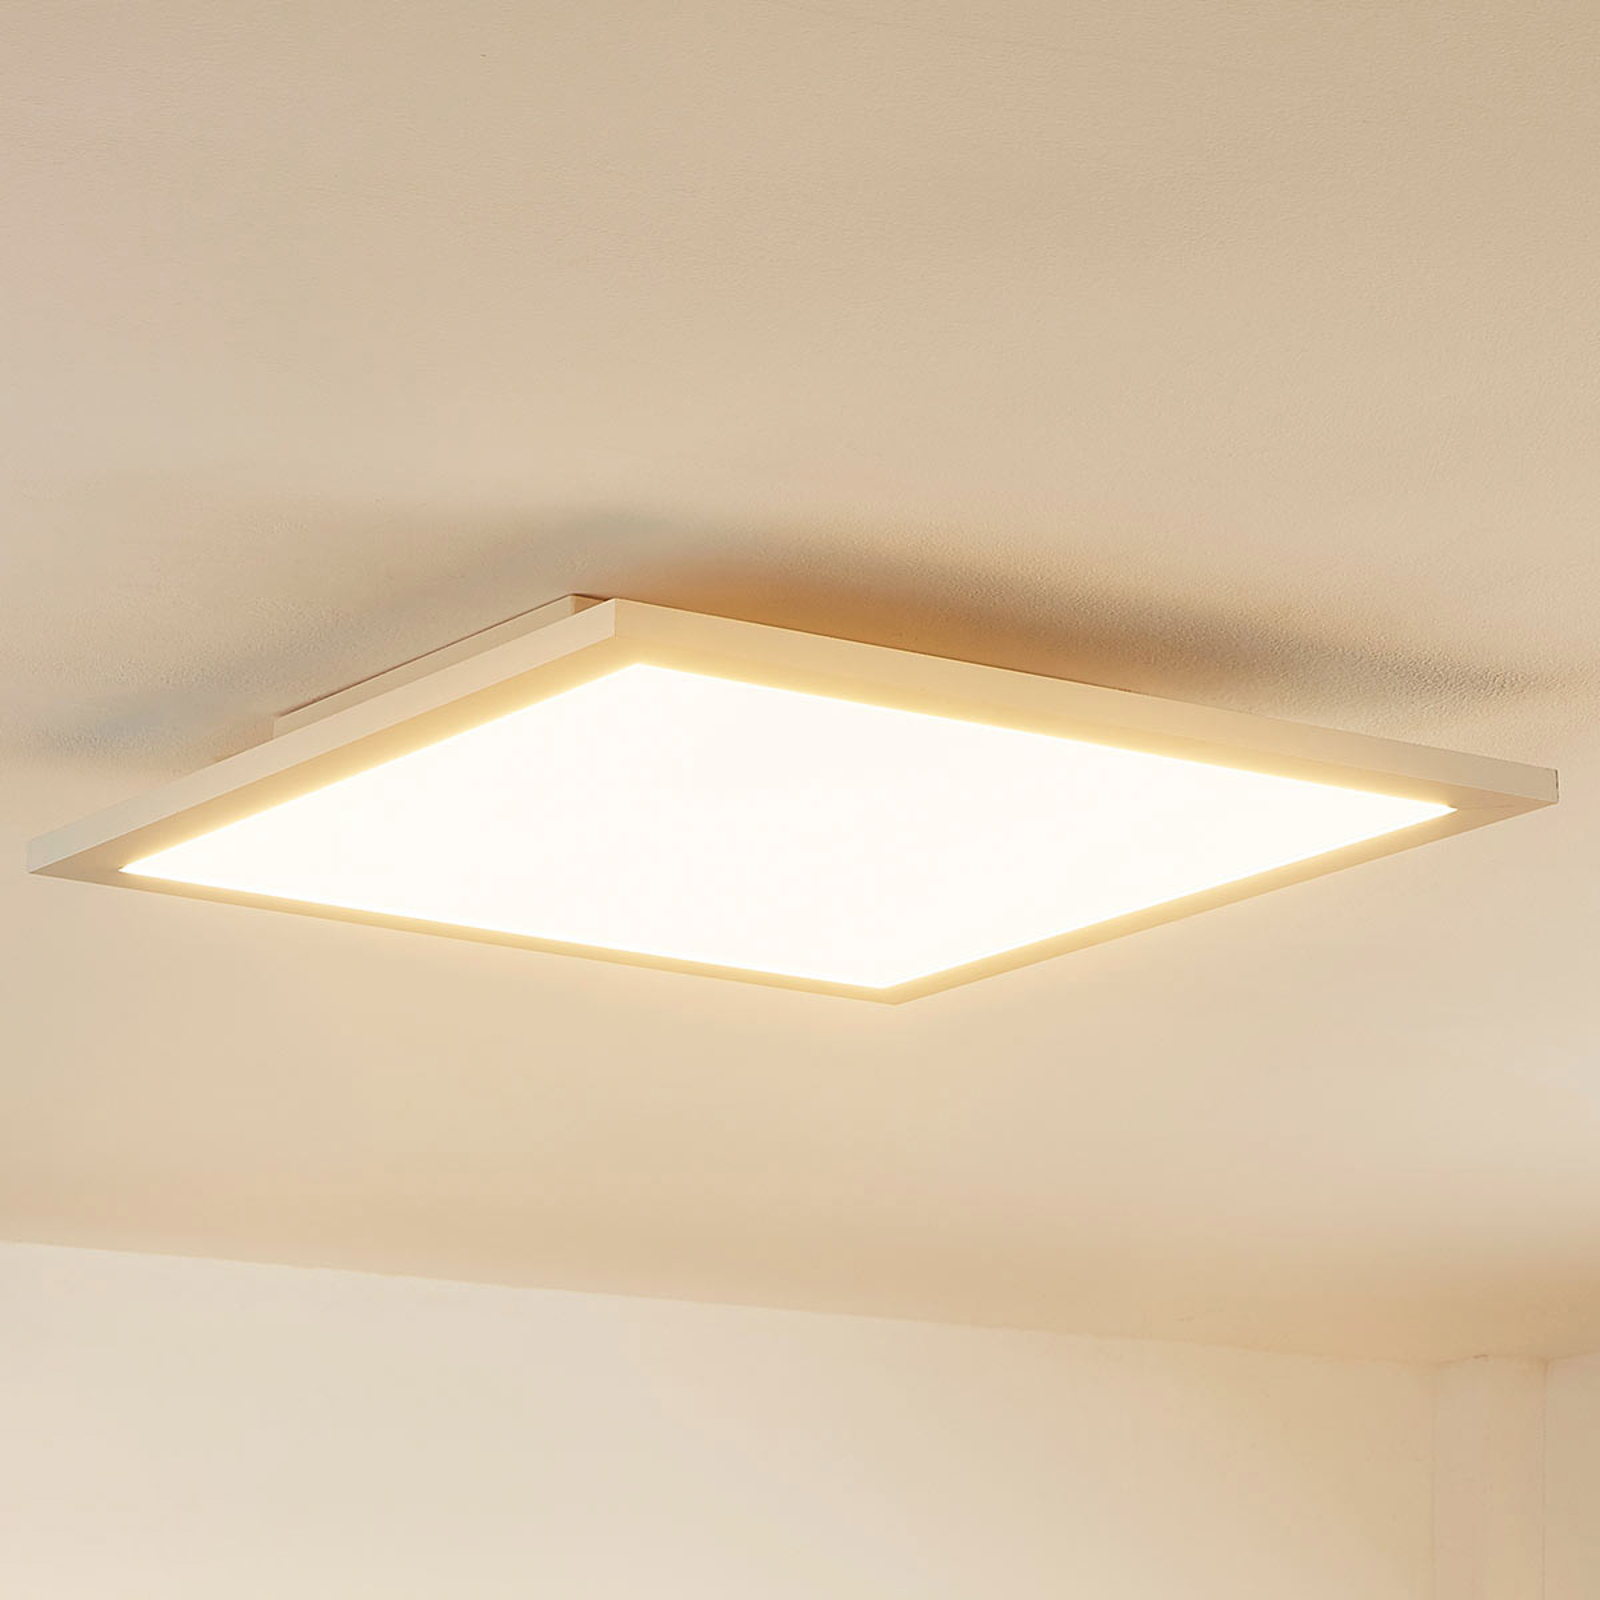 Arcchio Enja LED-Panel, 39,5 cm x 39,5 cm